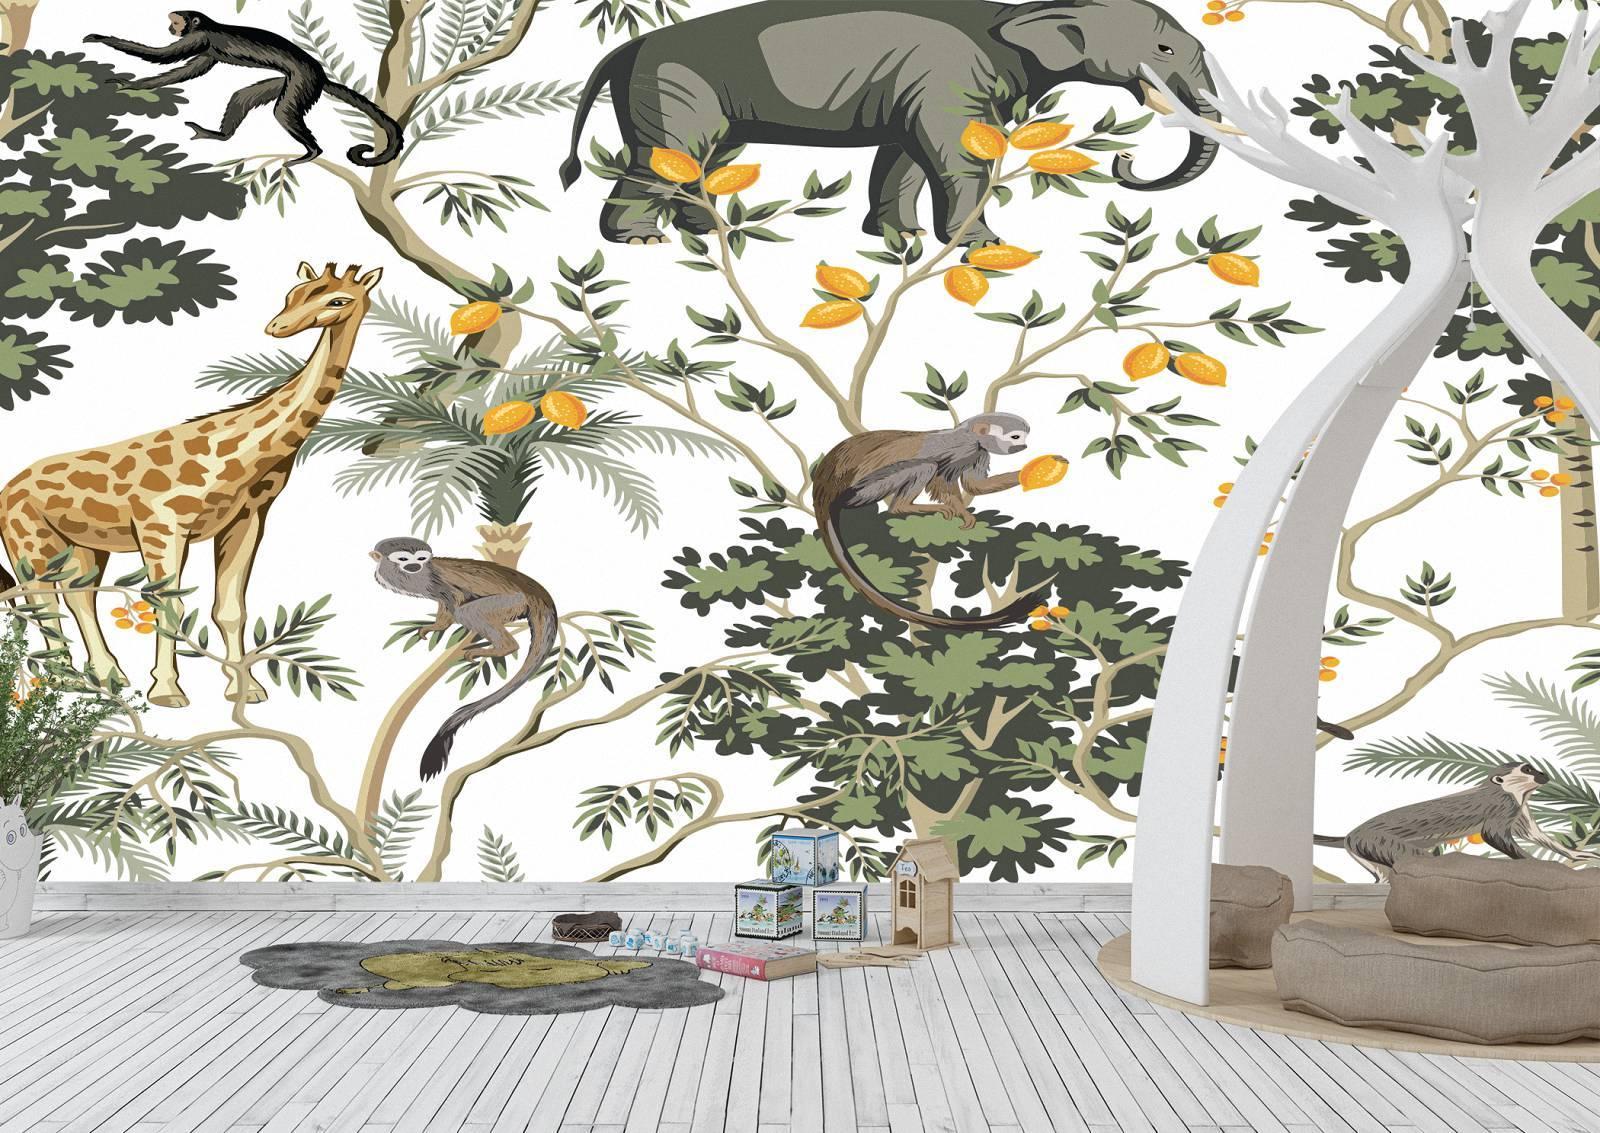 African Animals Background Wall Mural Photo Wallpaper UV Print Decal Art Décor